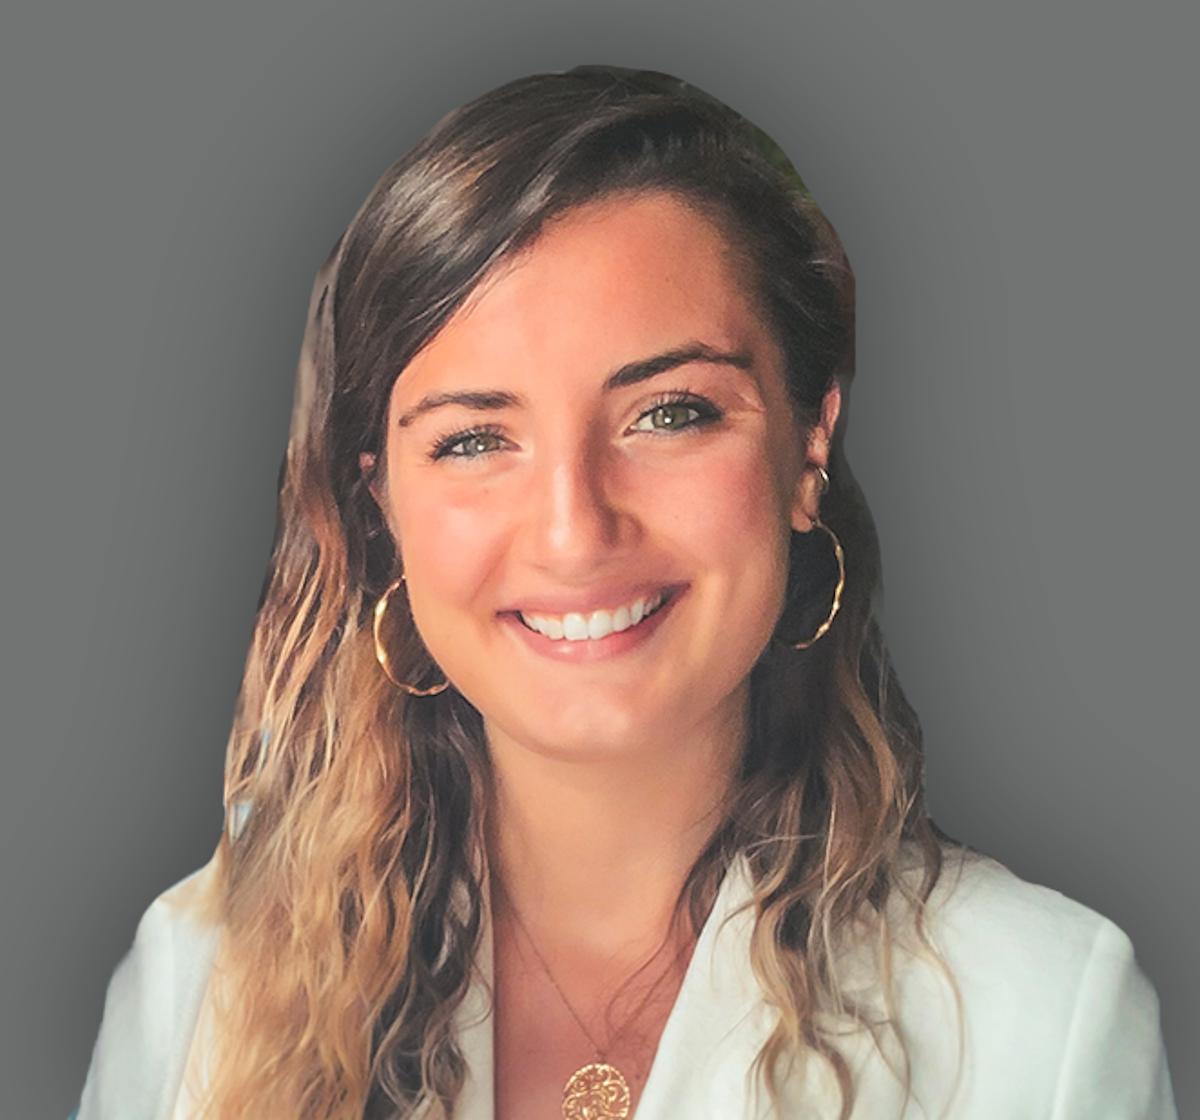 Entrepreneur Jodie SInclair